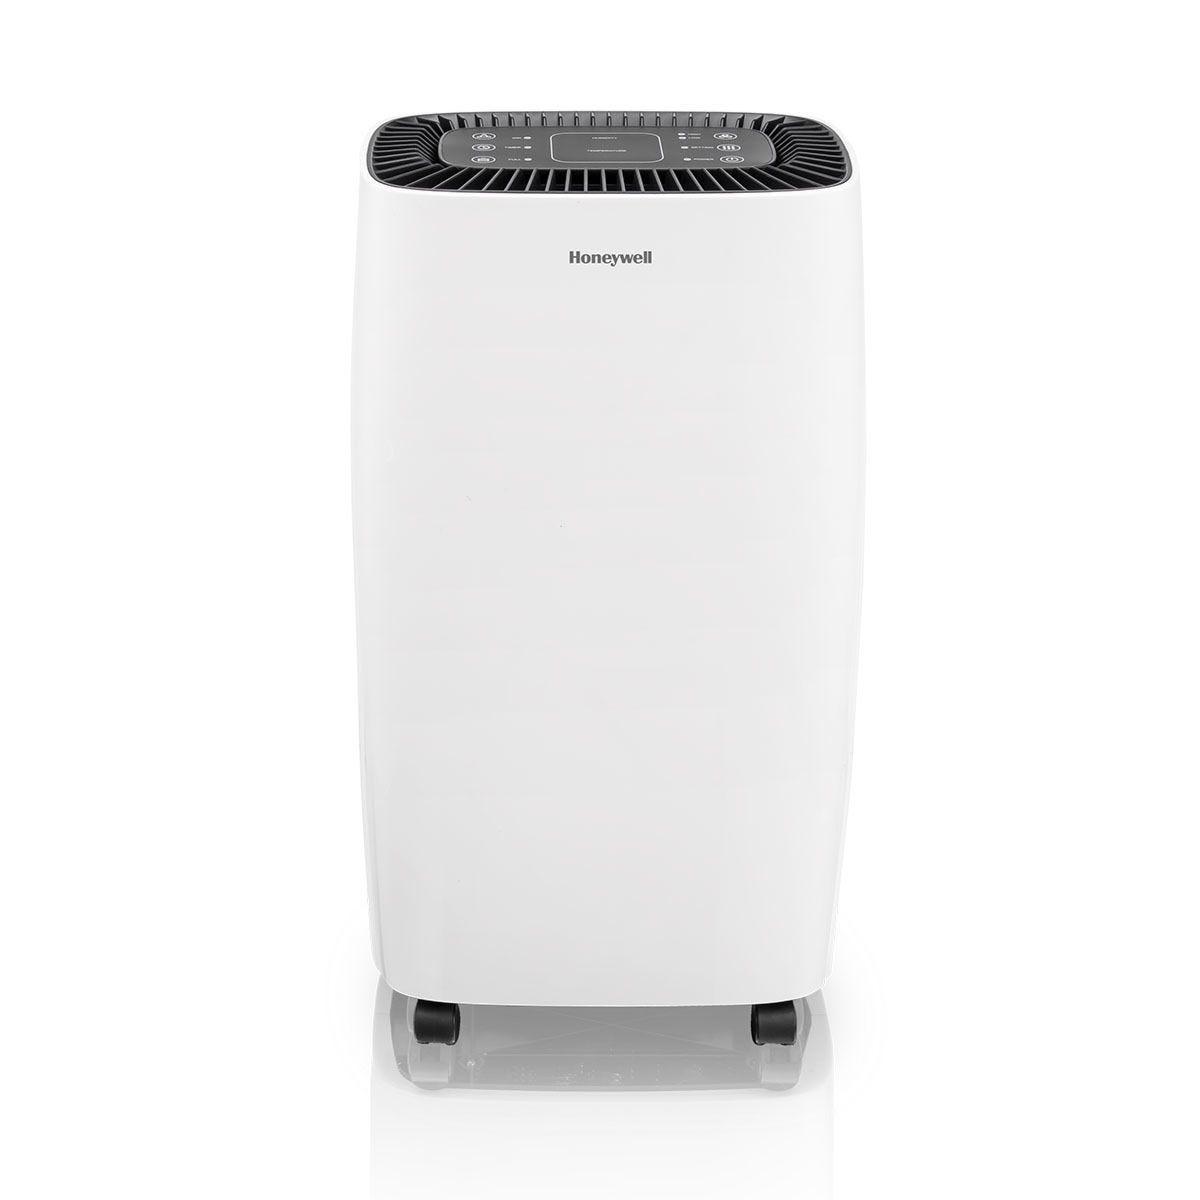 Honeywell 12 Litre Portable Dehumidifier White